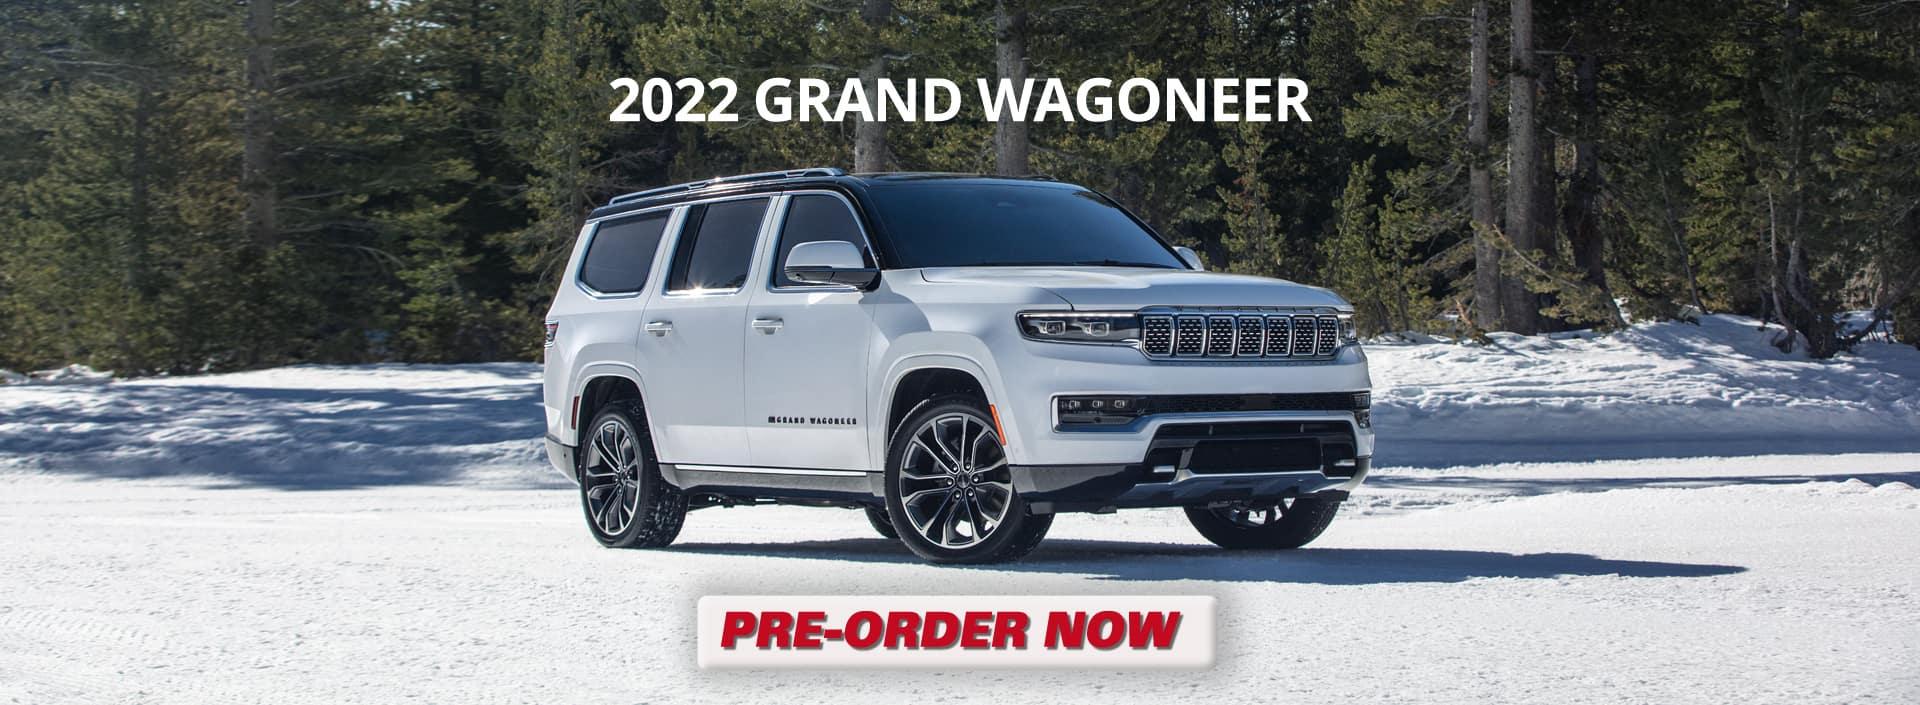 2021_Grand_Wagoneer_Sep21